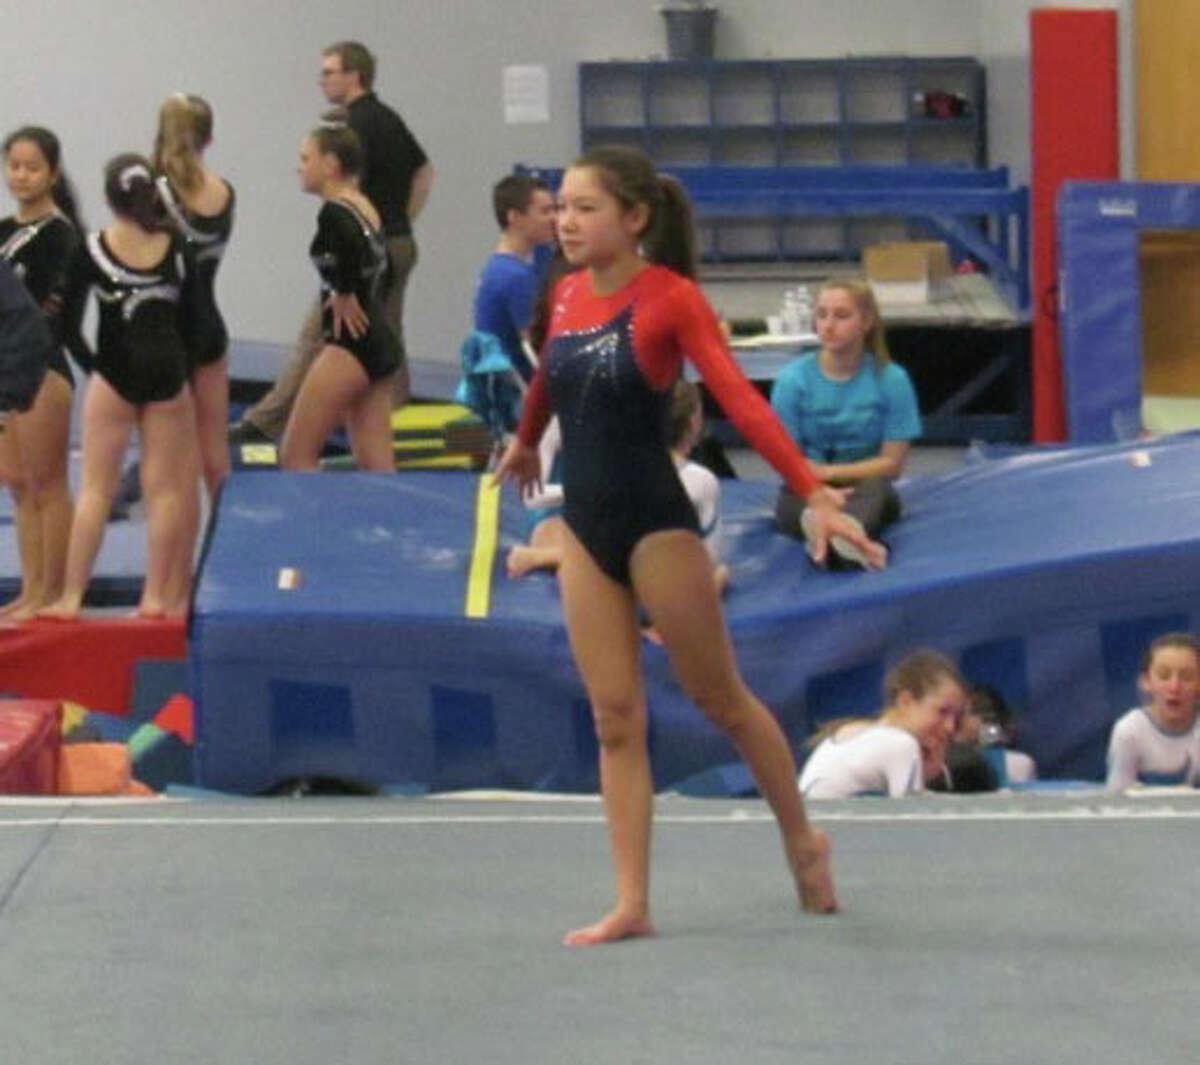 Darien YMCA House Team Level 4 gymnast Katie Weinberg competes on floor at the Lakewood-Trumbull YMCA.